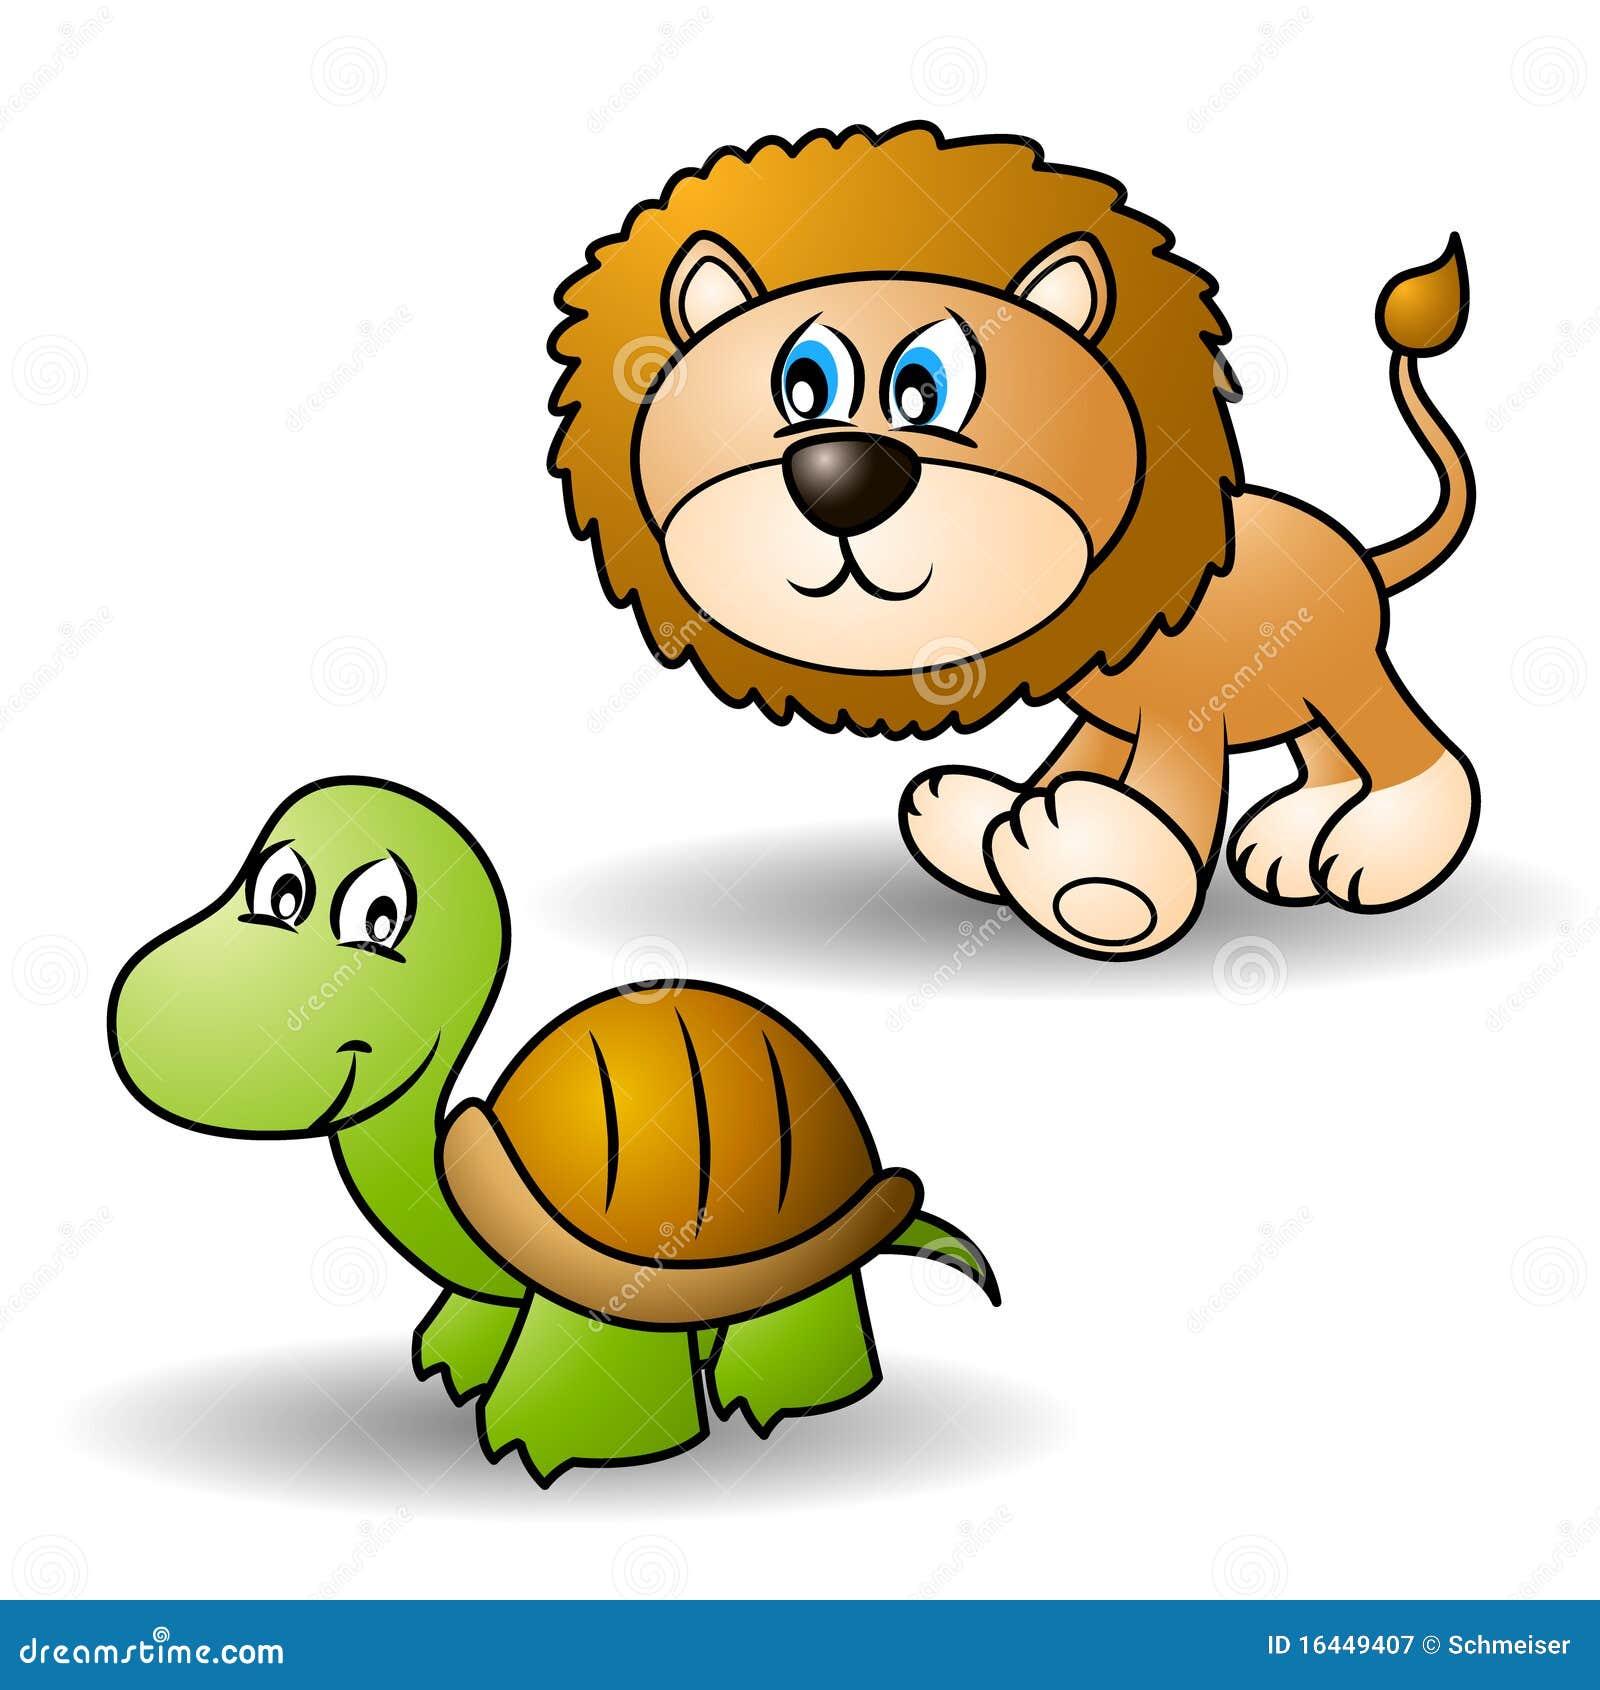 More similar stock images of cartoon animals set 1